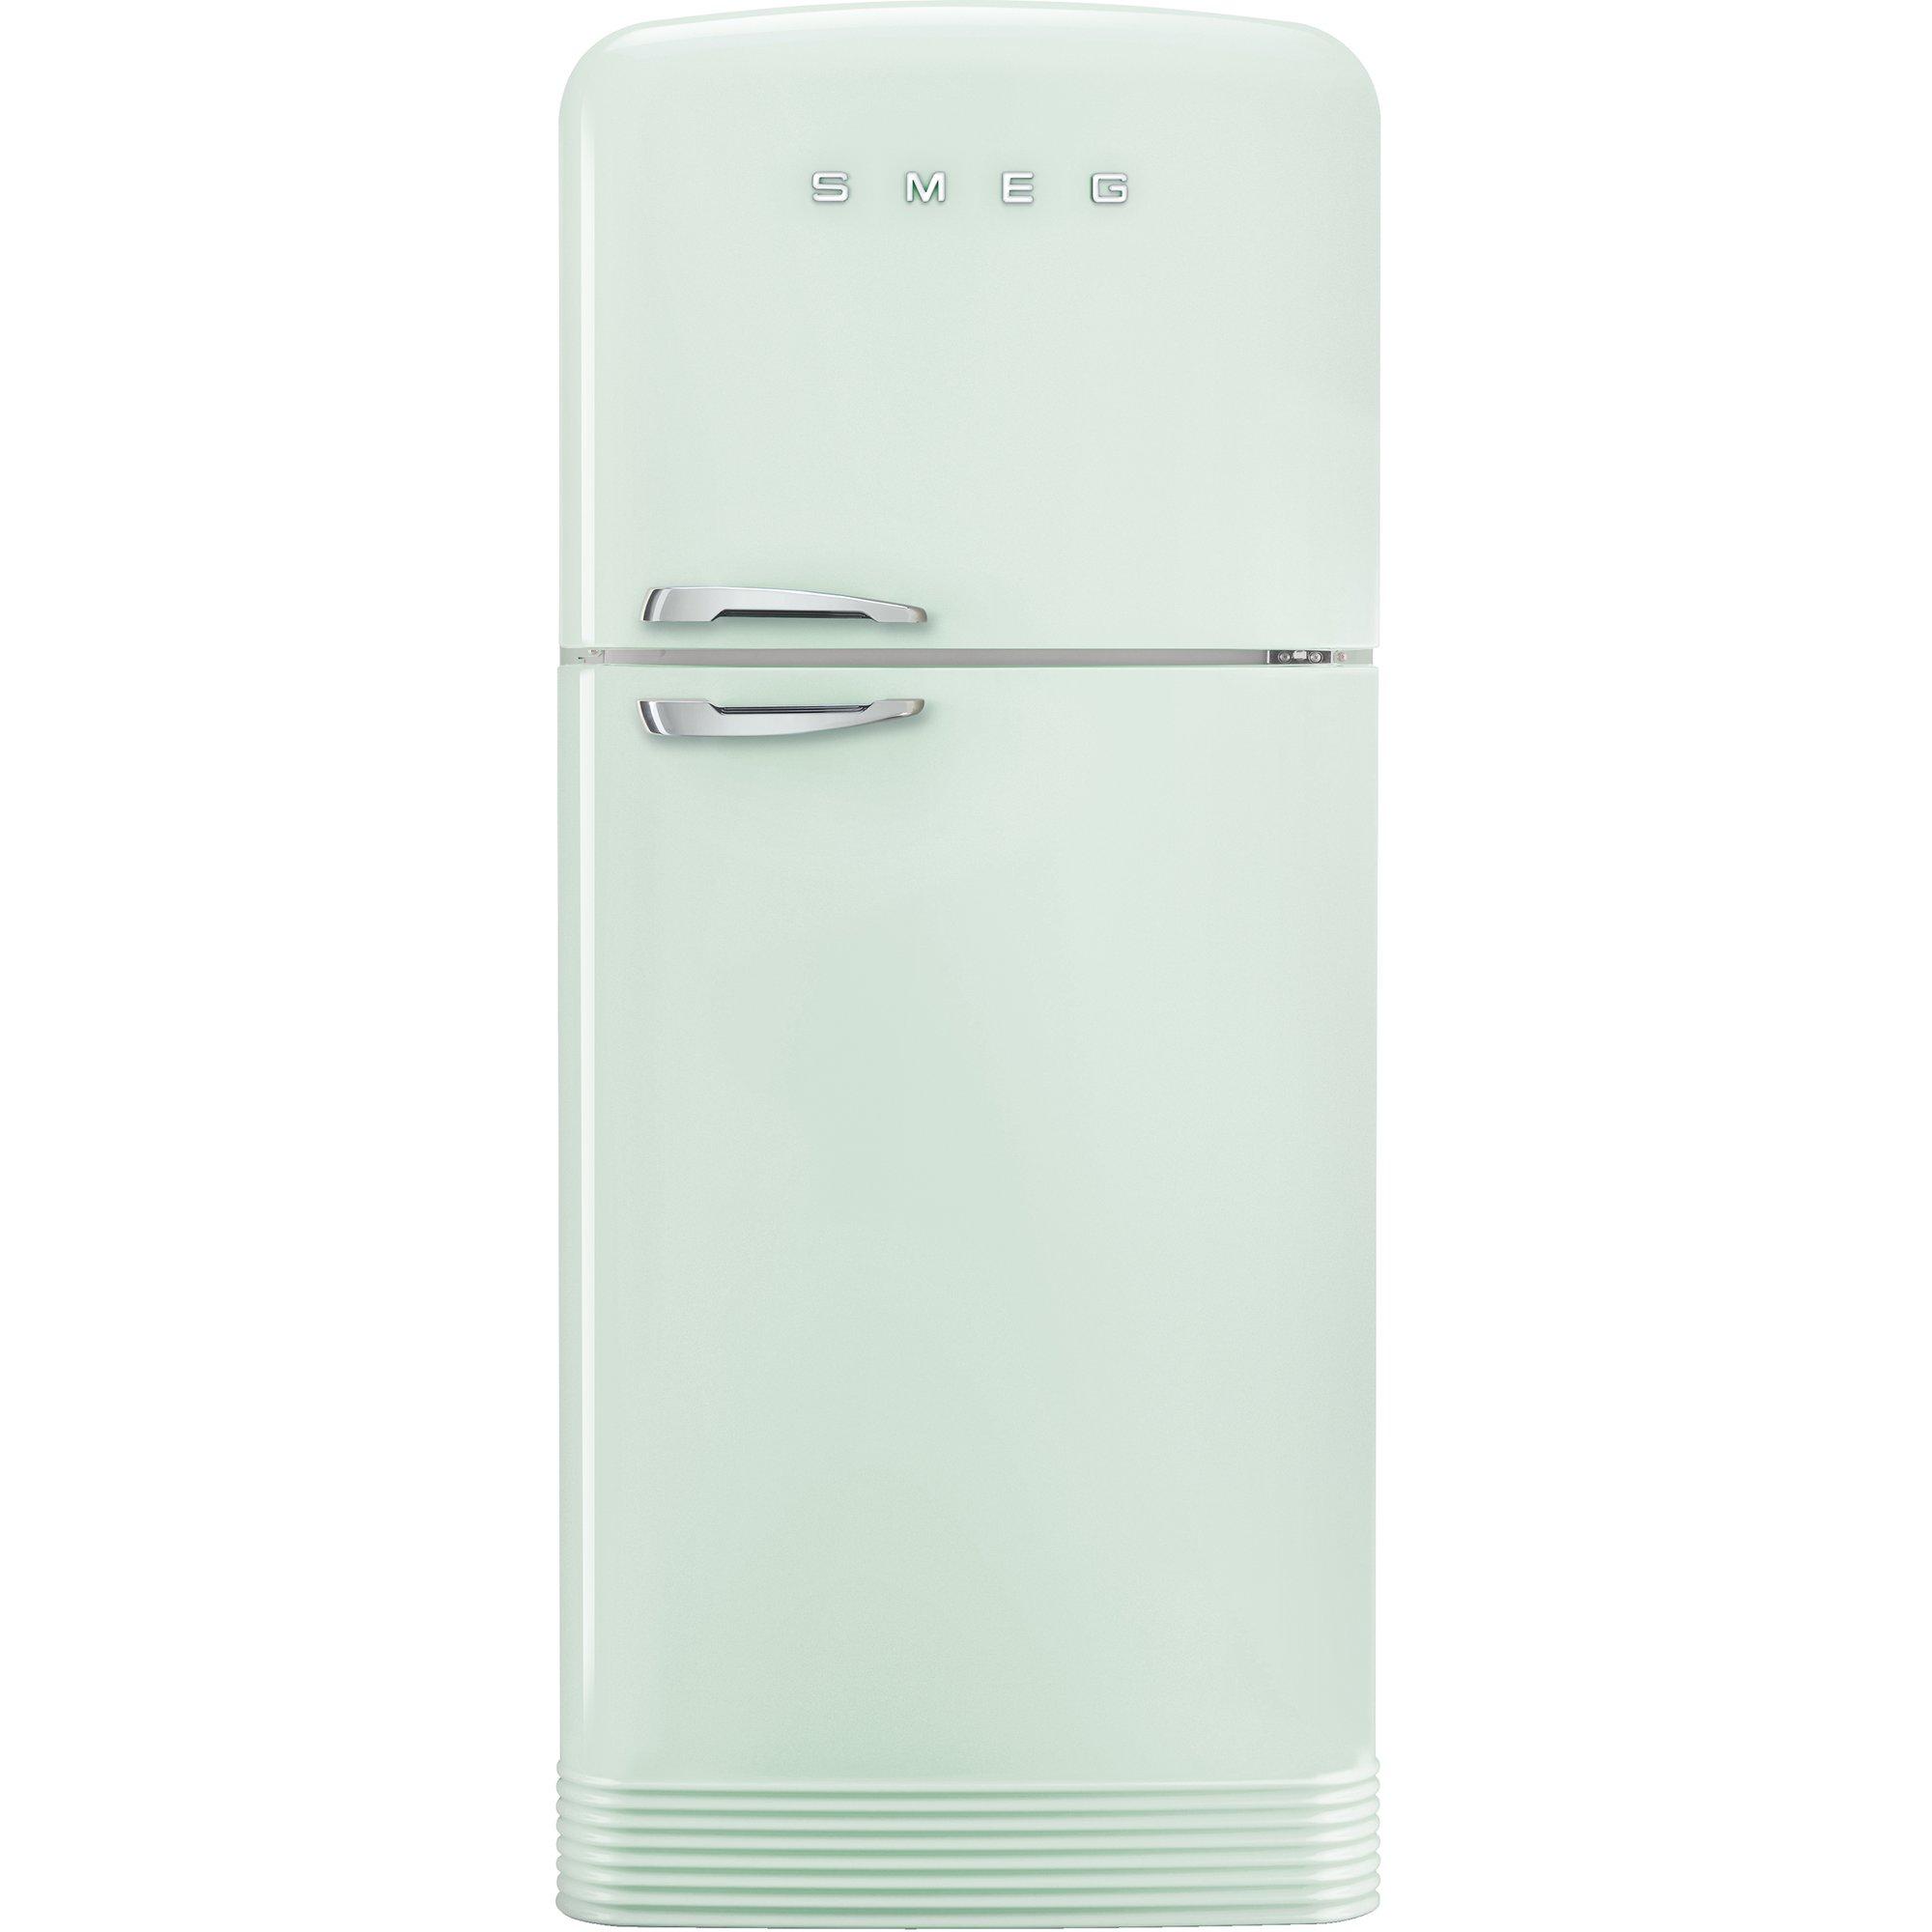 Smeg Kylskåp/frys i retrodesign högerhängt pastellgrön